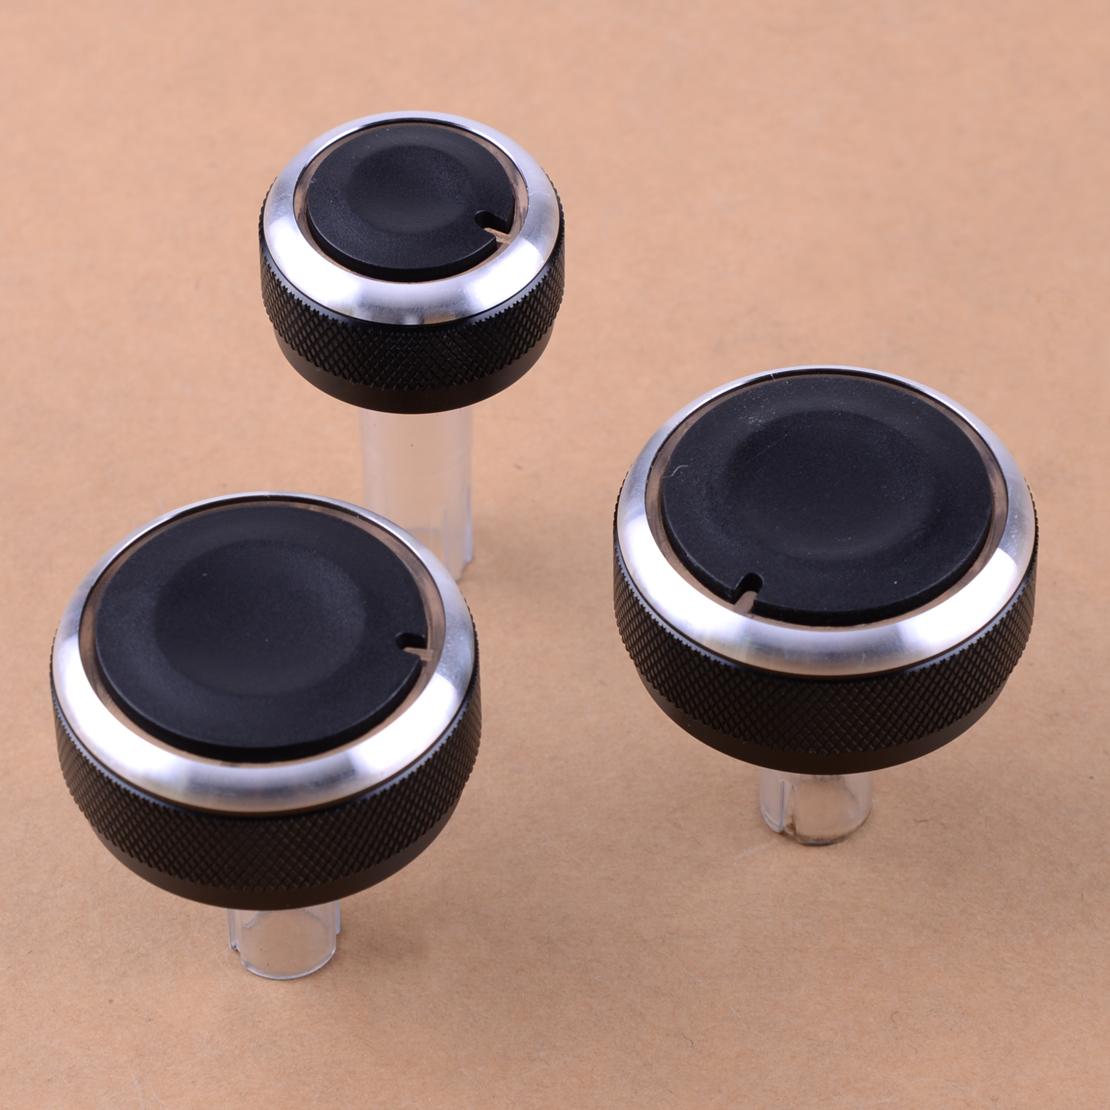 3pc ALU AC Heater Dash Climate Switch Knobs Buttons for Skoda Superb Octavia MK1